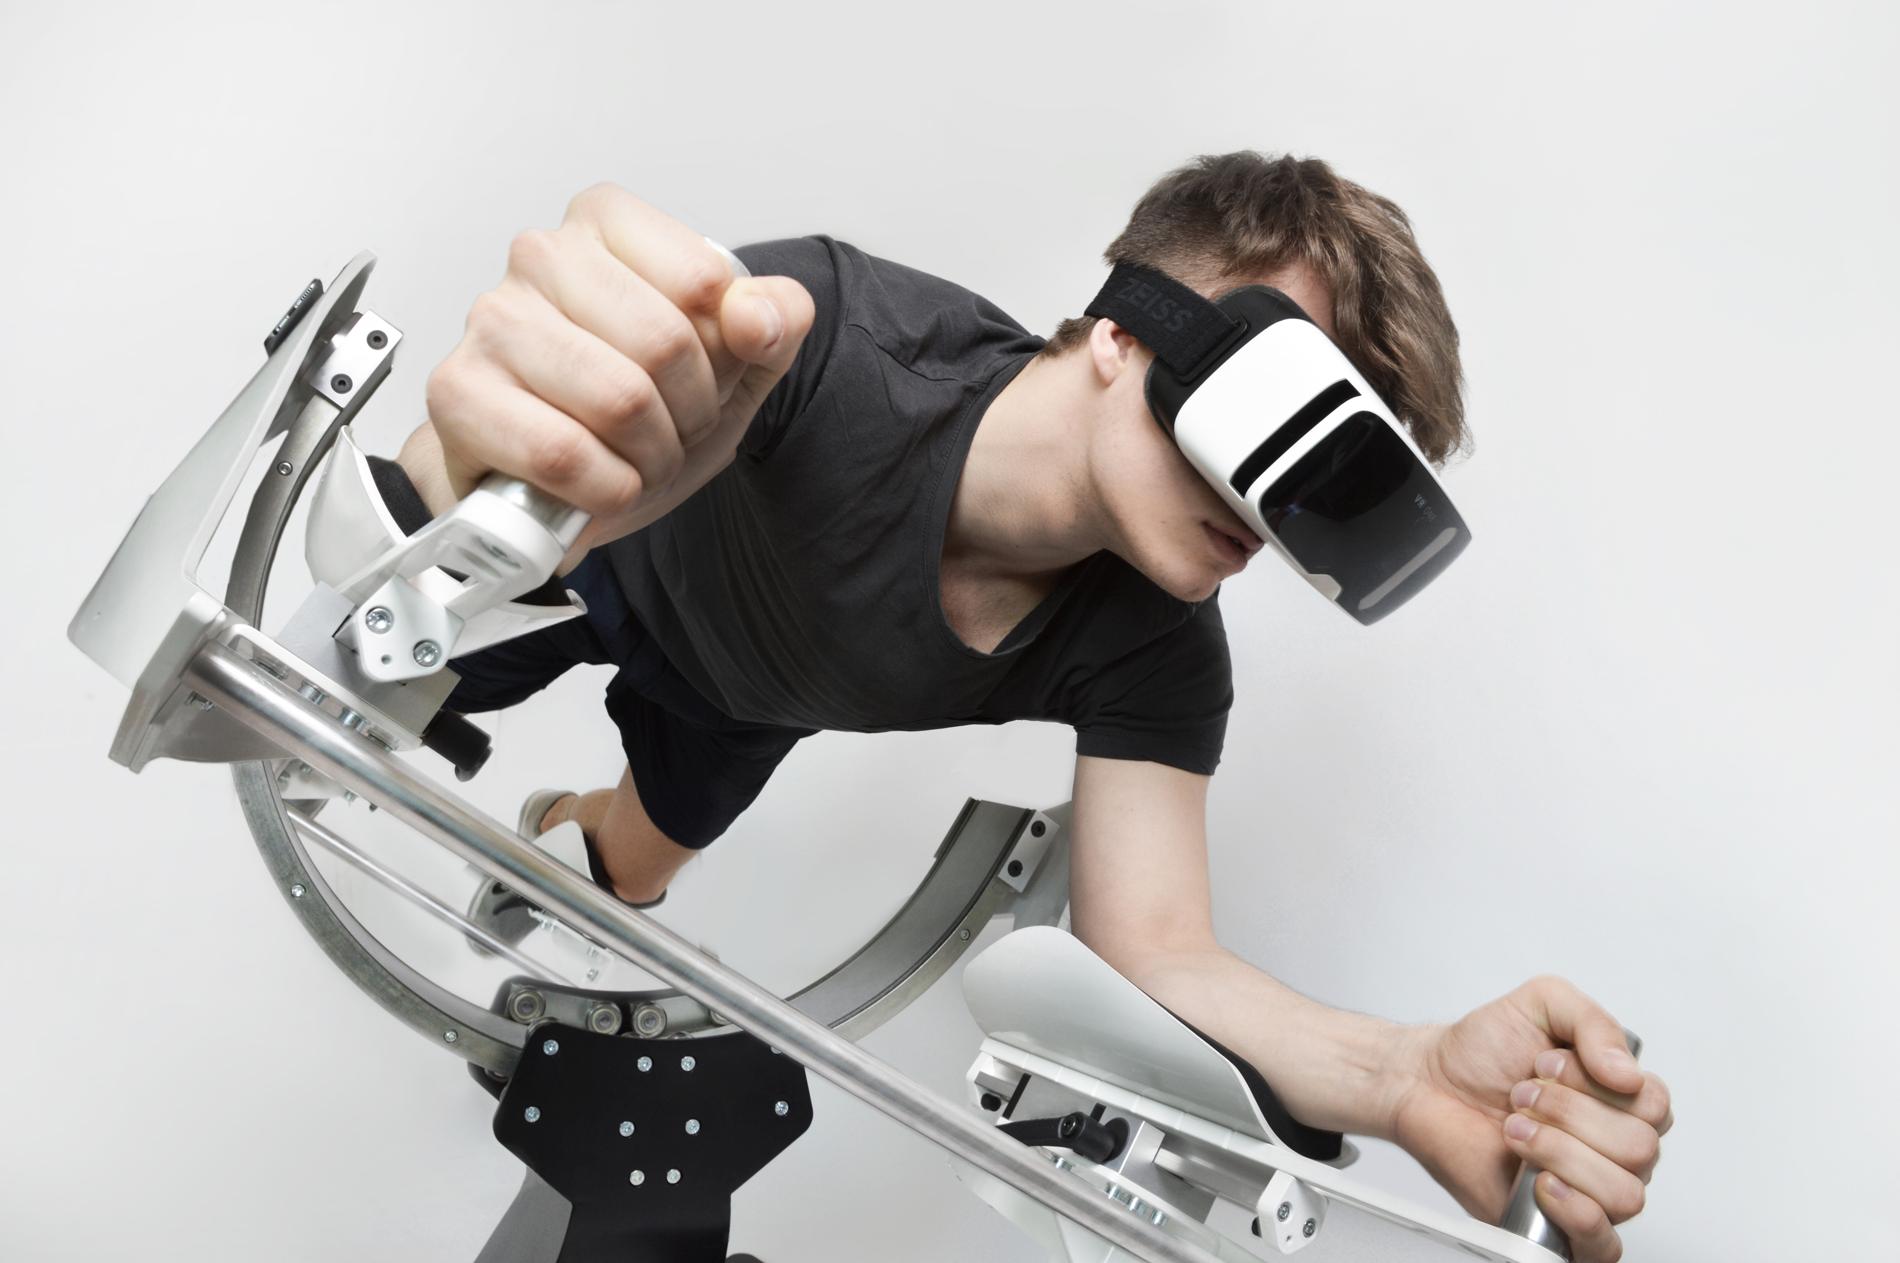 VR exercise icaros